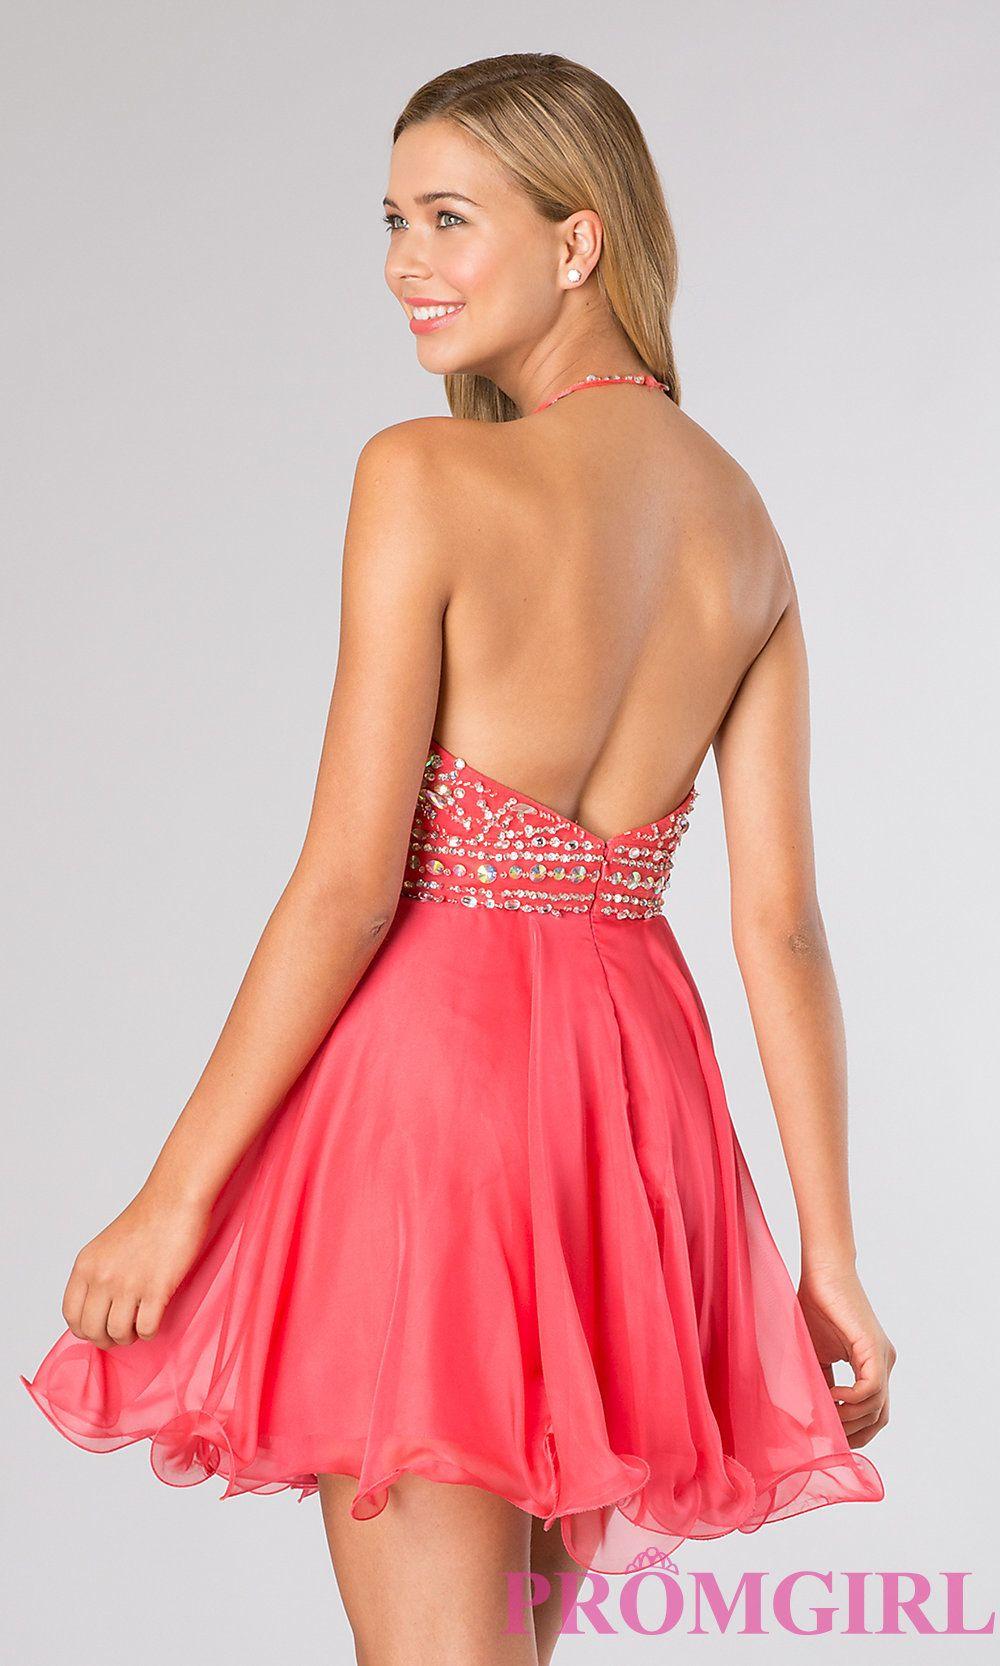 Blush short halter top homecoming dresspromgirl fashion